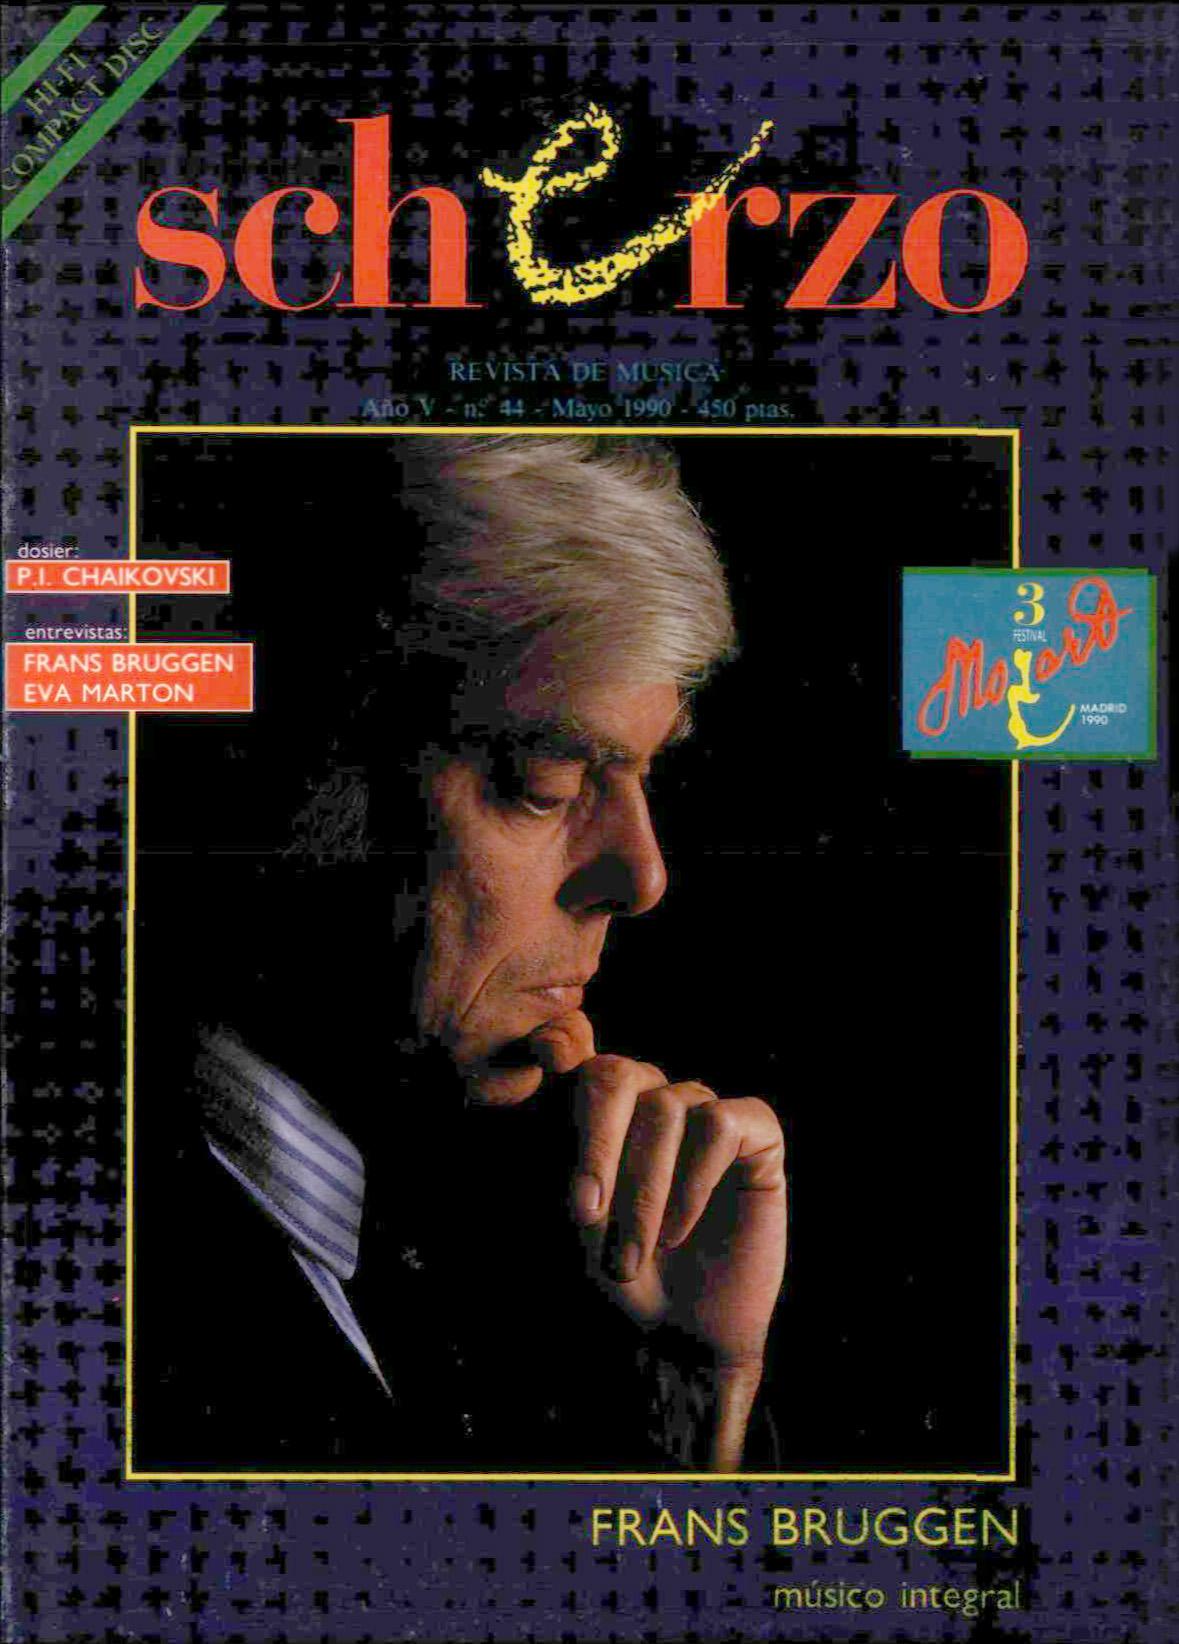 Mayo 1990